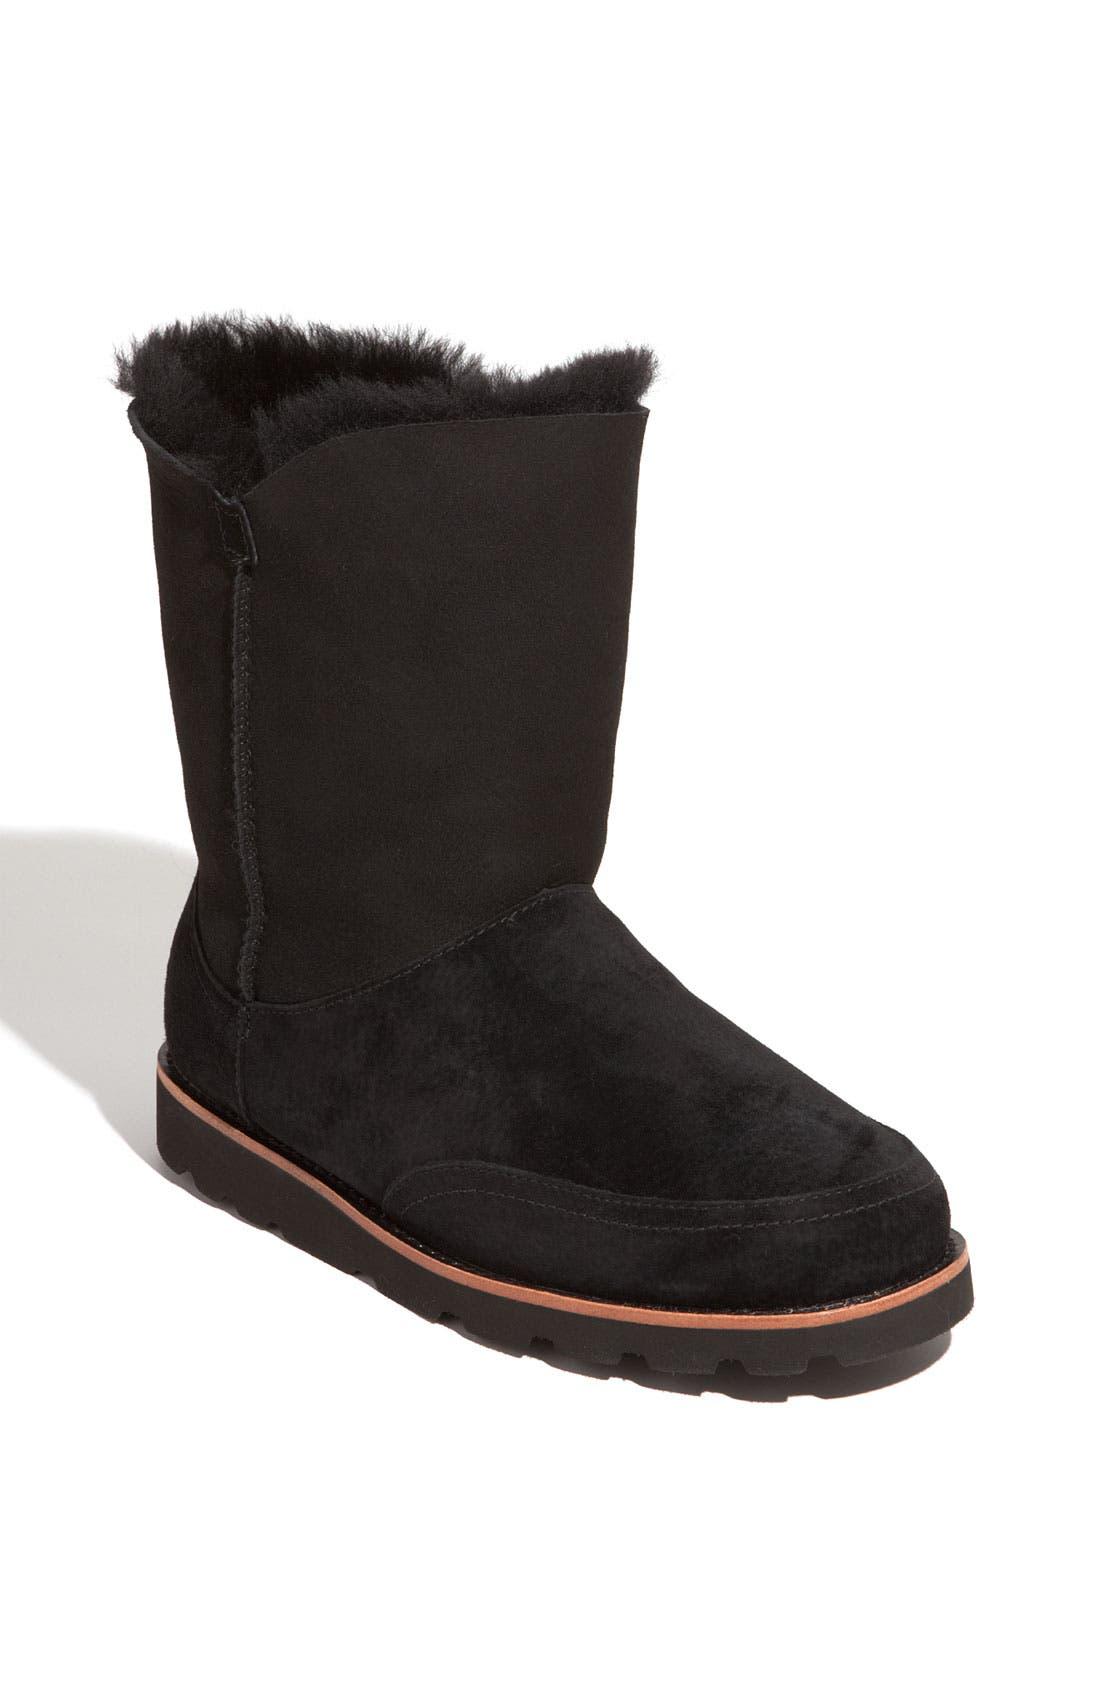 Main Image - UGG® Australia 'Shanleigh' Boot (Women)